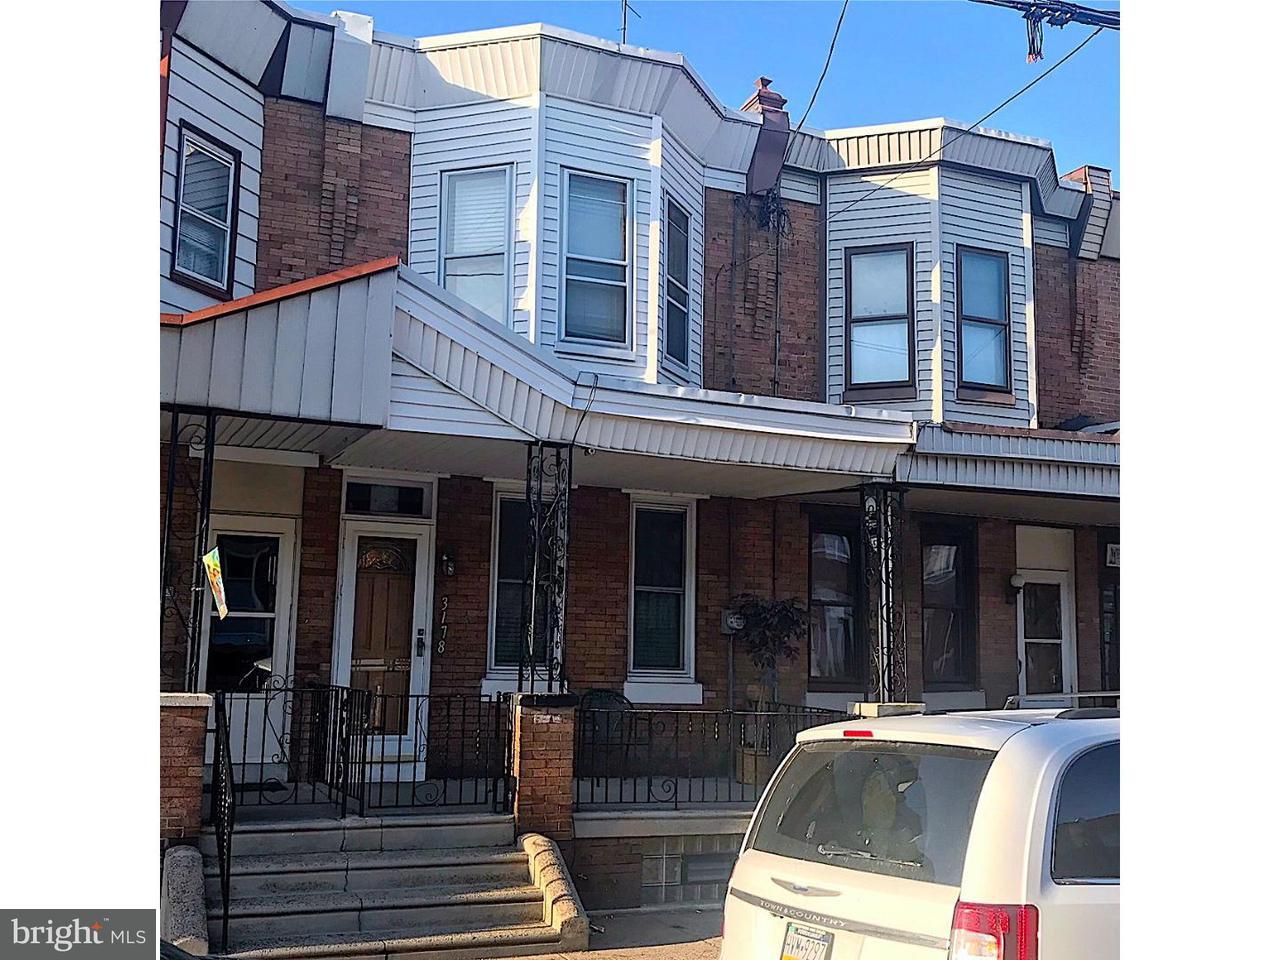 Casa unifamiliar adosada (Townhouse) por un Venta en 3178 TULIP Street Philadelphia, Pennsylvania 19134 Estados Unidos